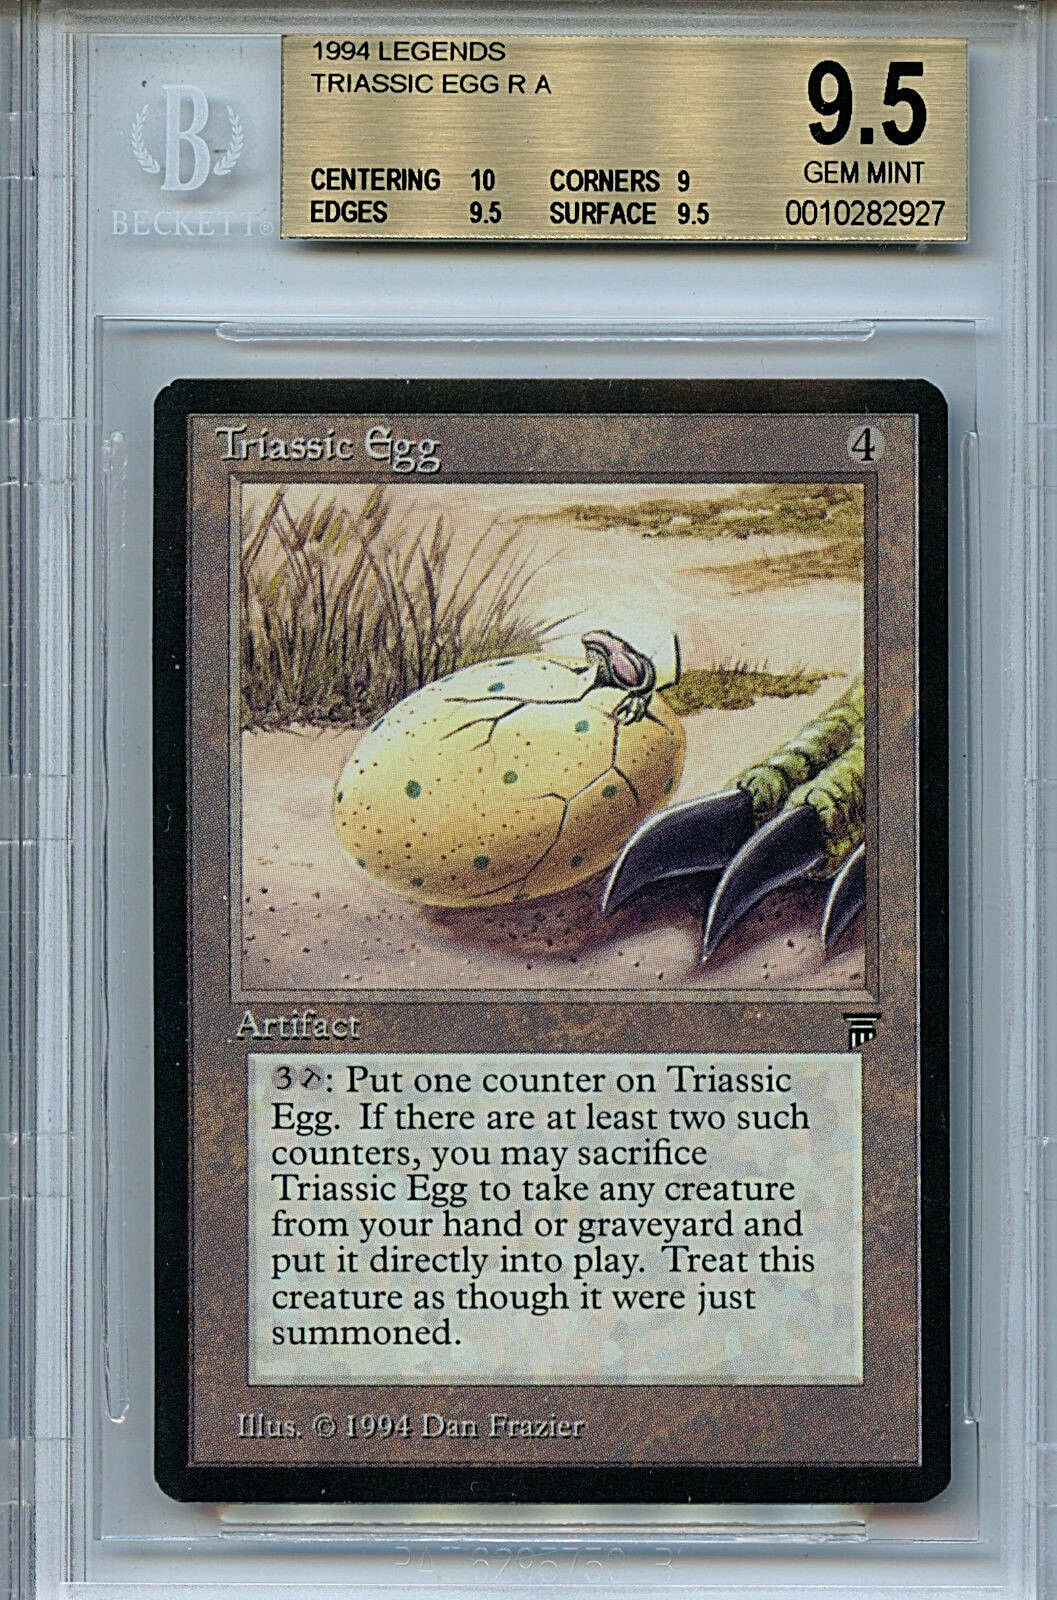 MTG Legends Triassic Egg BGS 9.5 Gem Mint card  with 10 Centering 2927